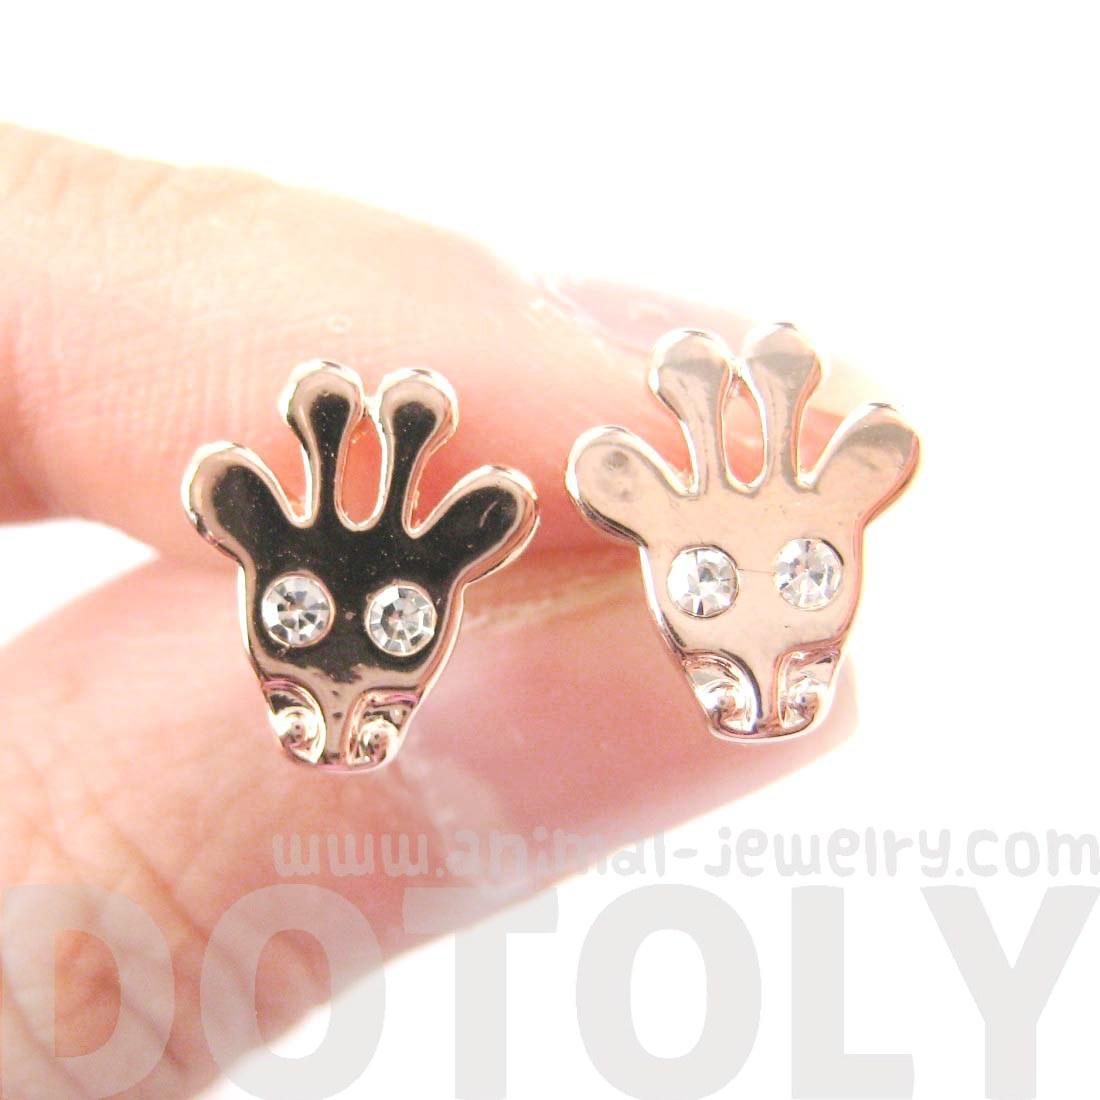 Cute Giraffe Face Shaped Stud Earrings With Rhinestone In Rose Gold   Thumbnail 1